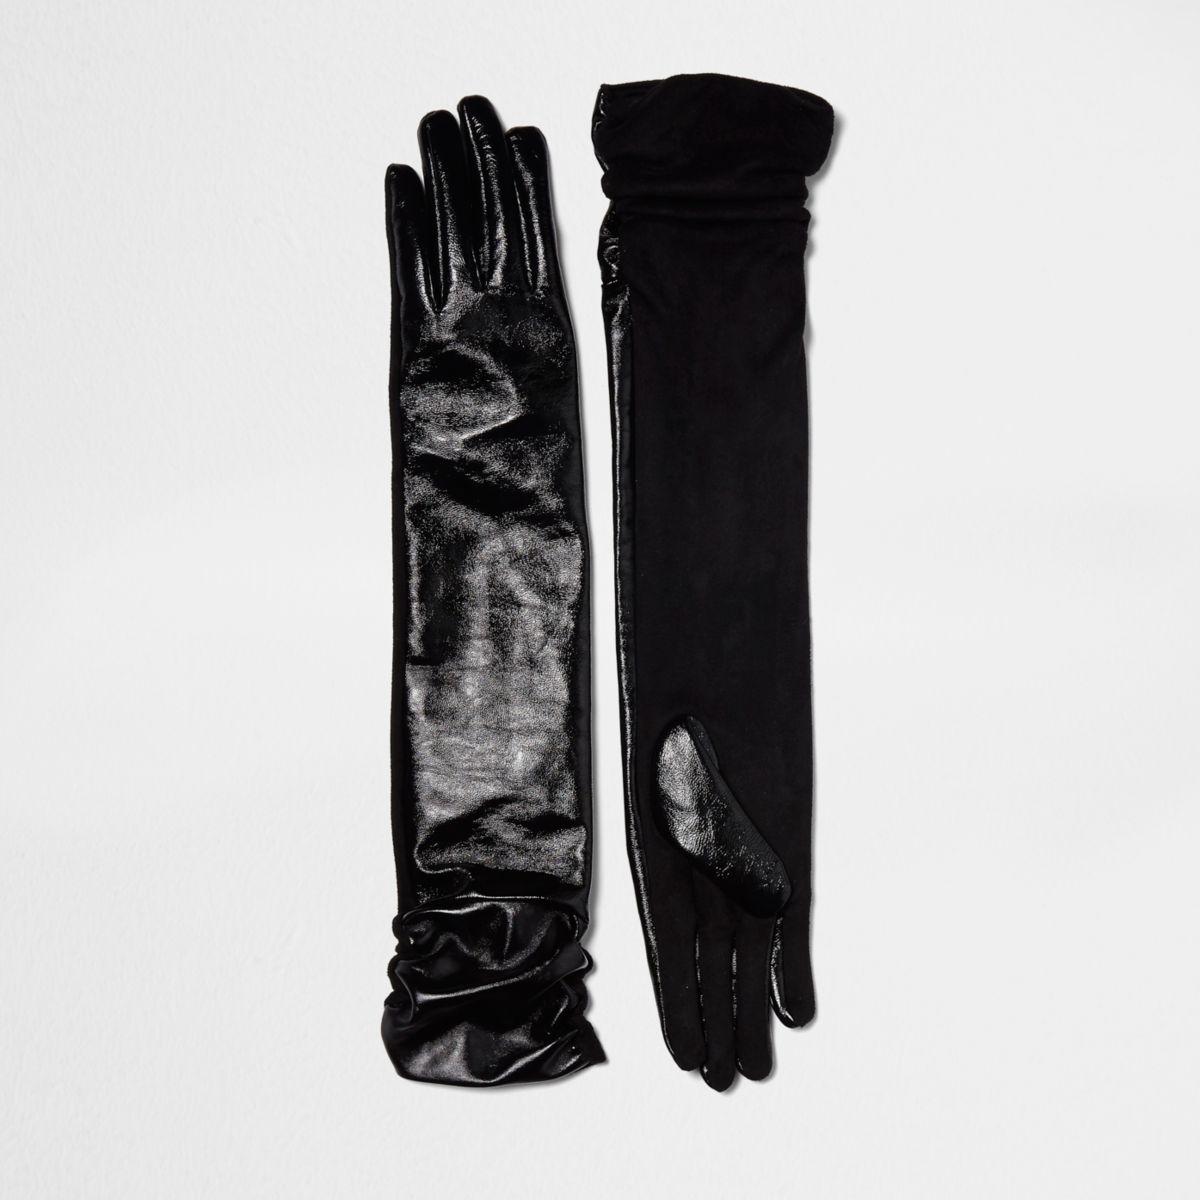 Schwarze, lange Lederhandschuhe